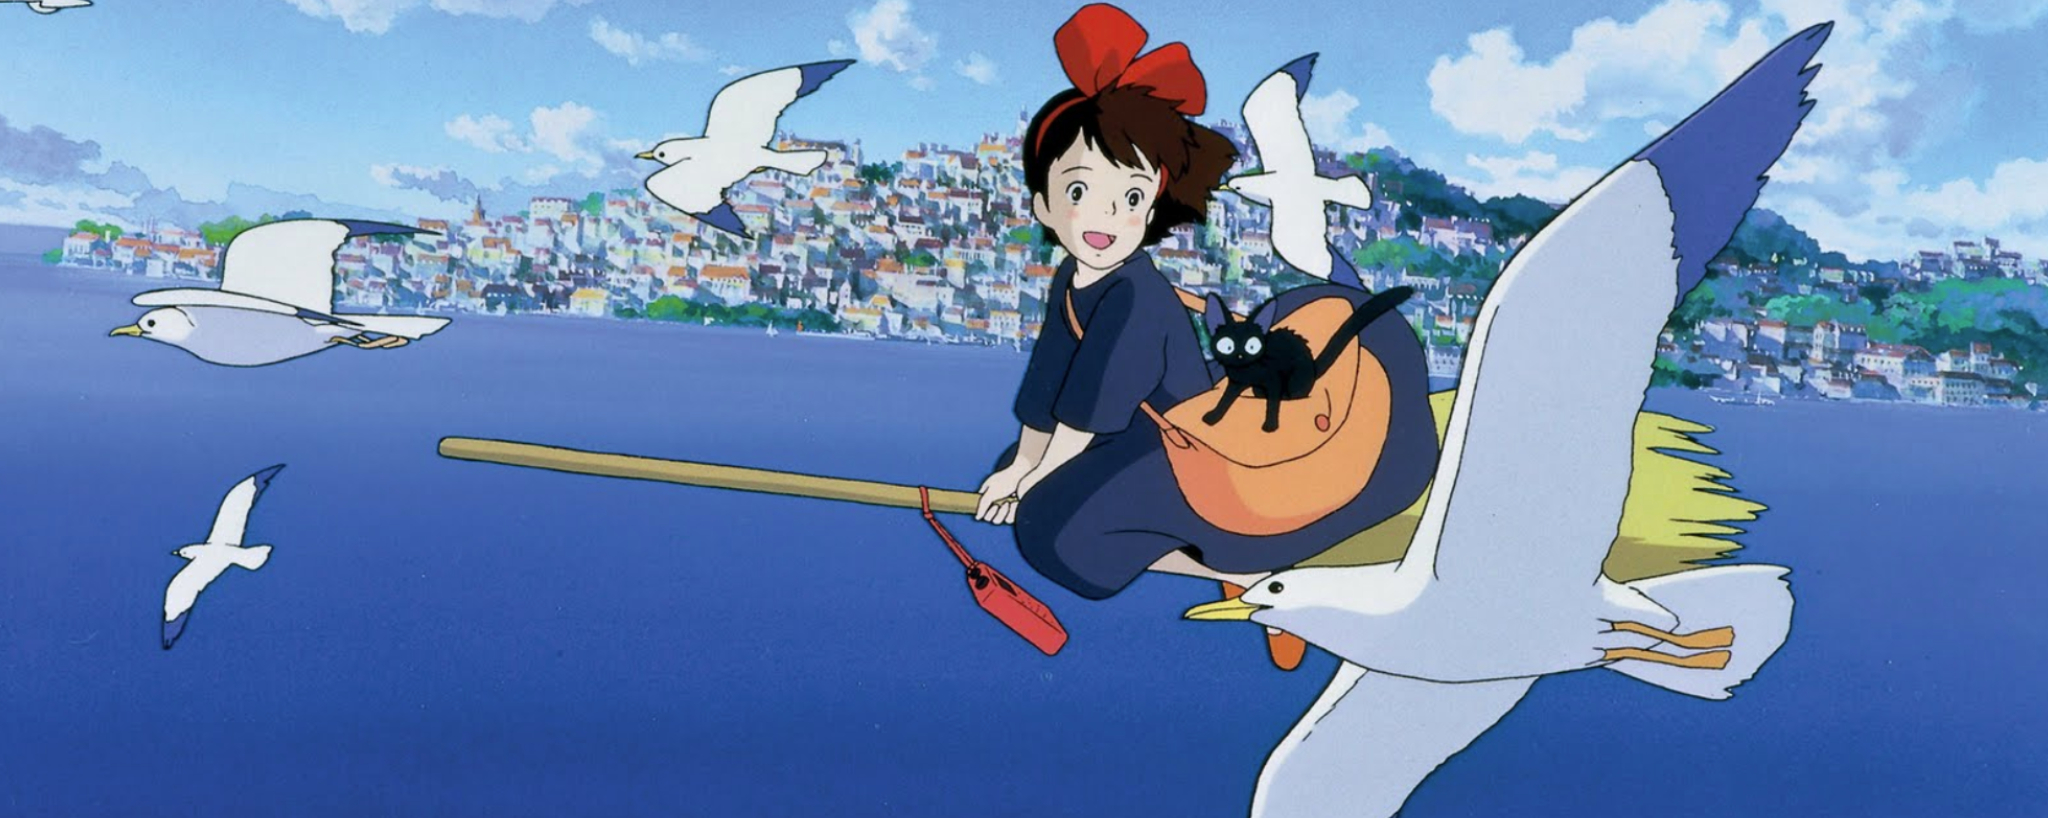 Kiki and Jiji flying on her broomstick